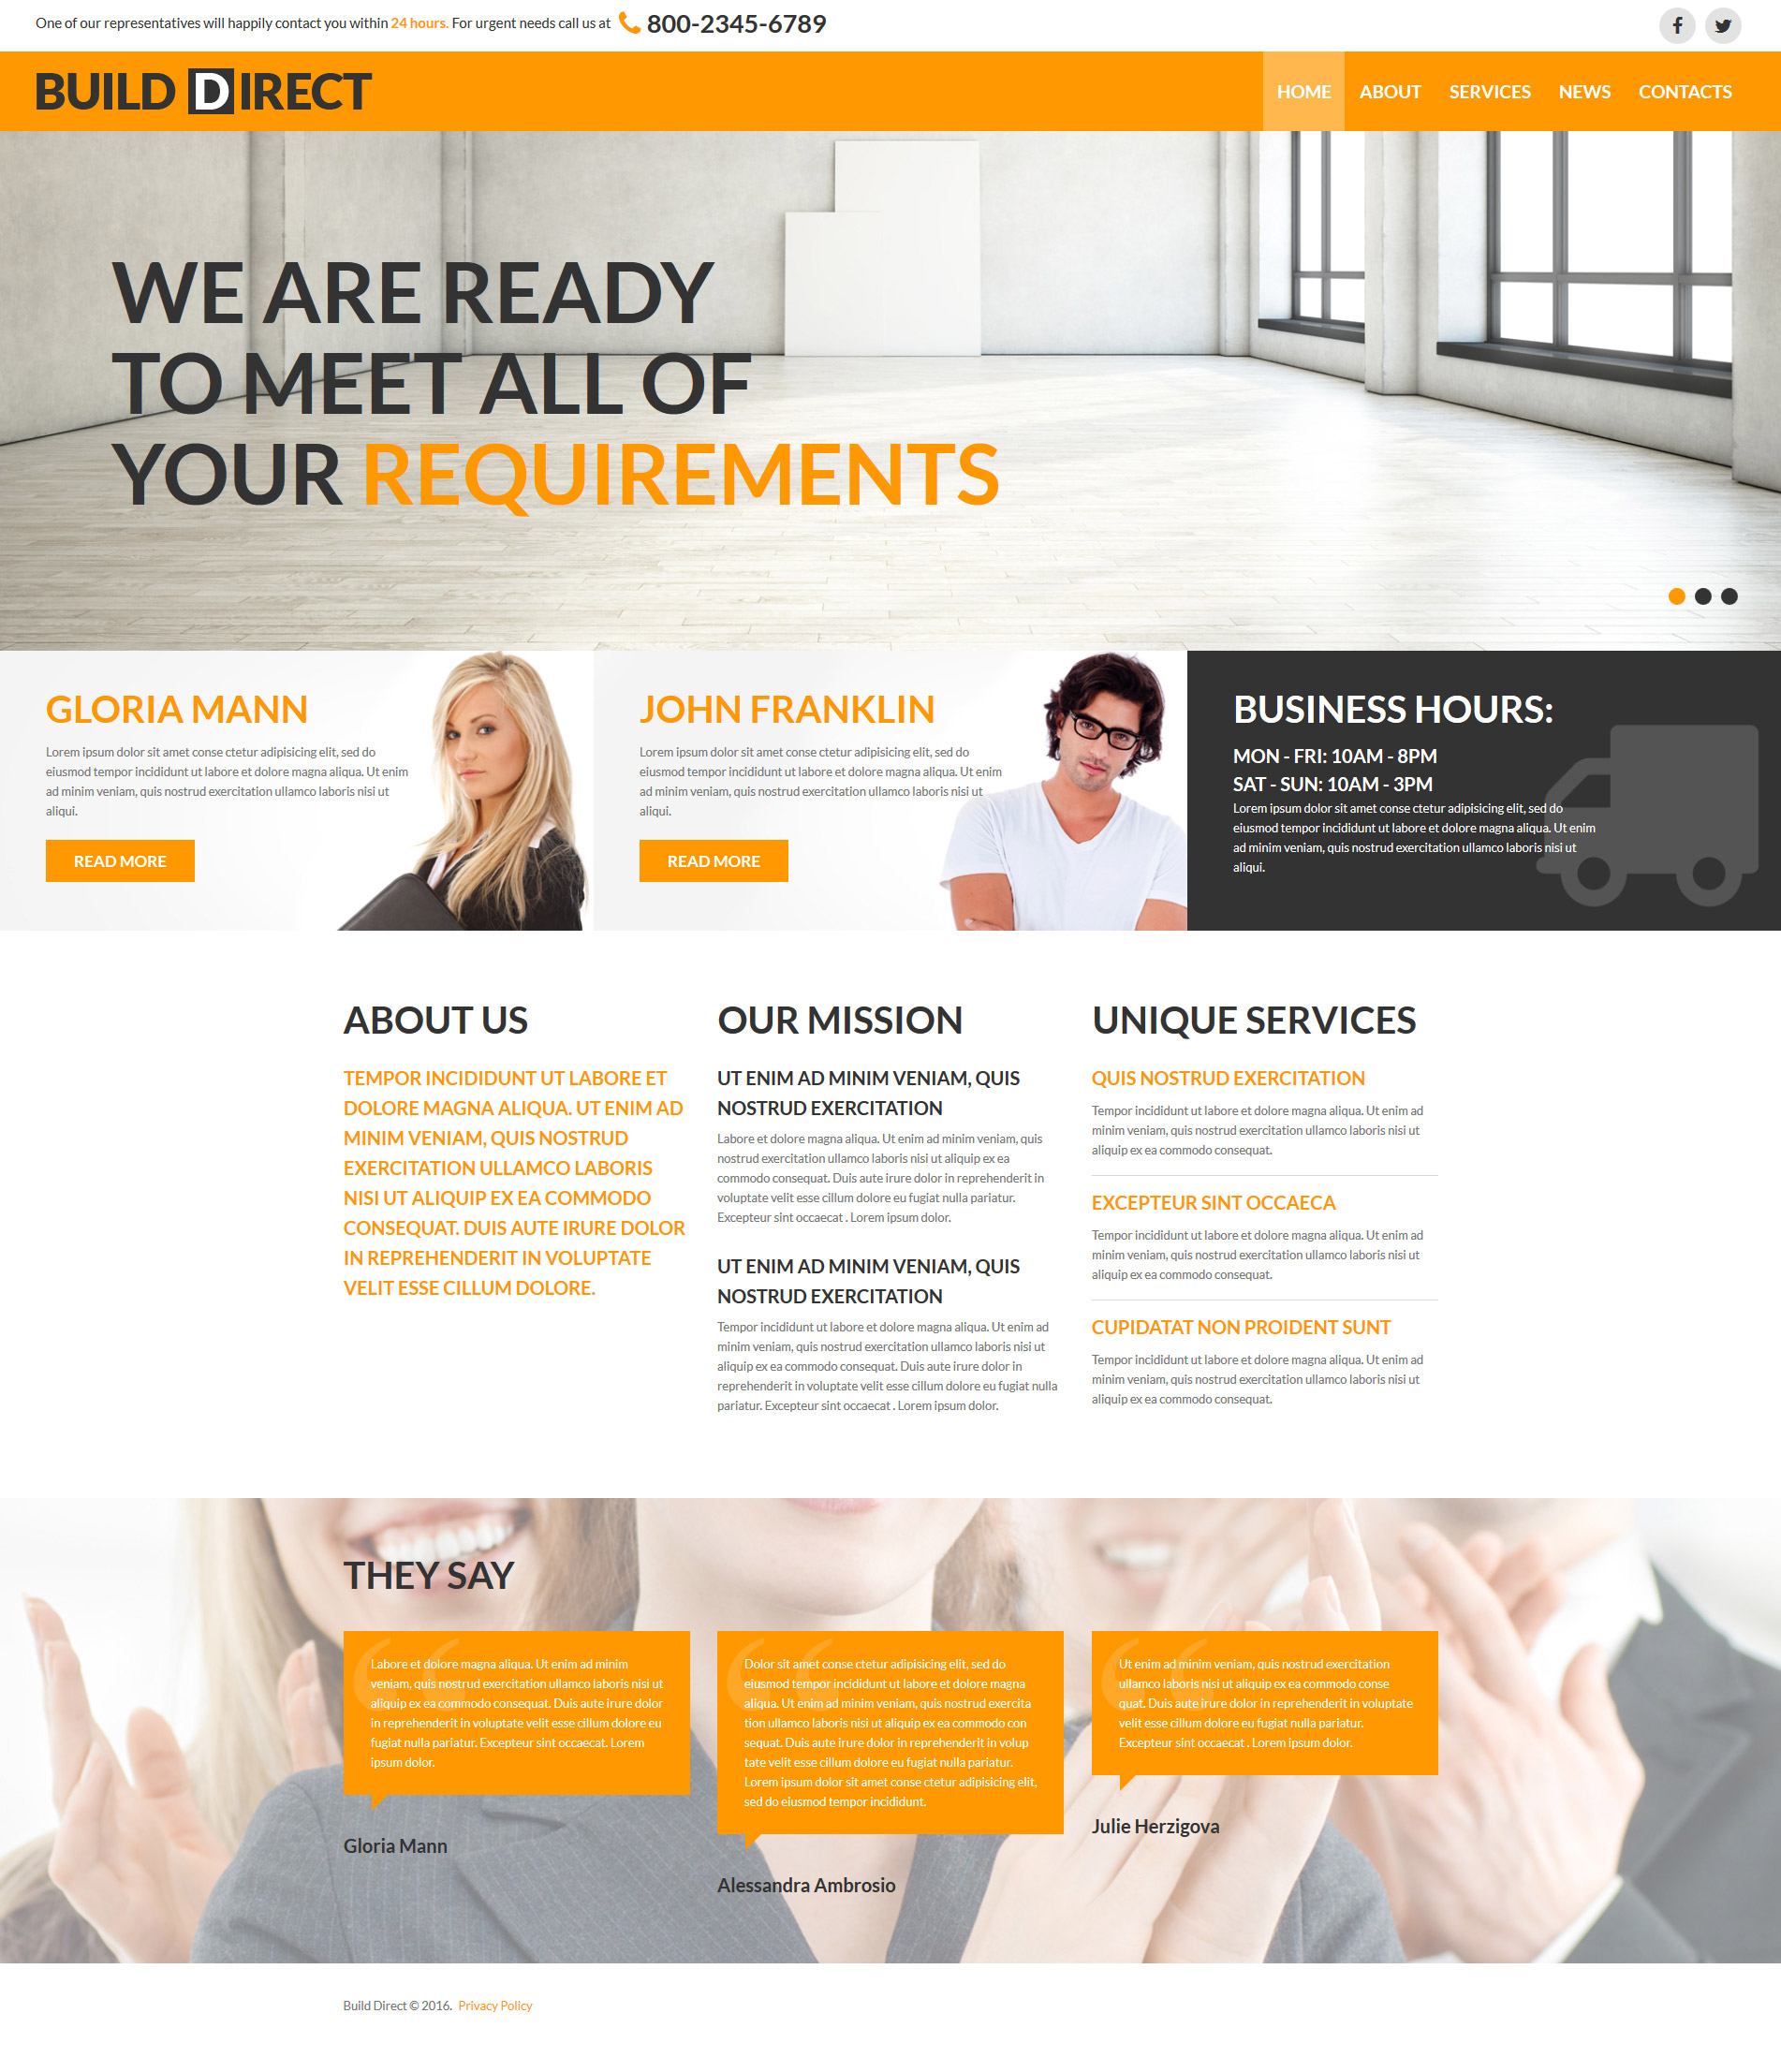 Szablon Joomla Construction Company Free Modern #58786 - zrzut ekranu